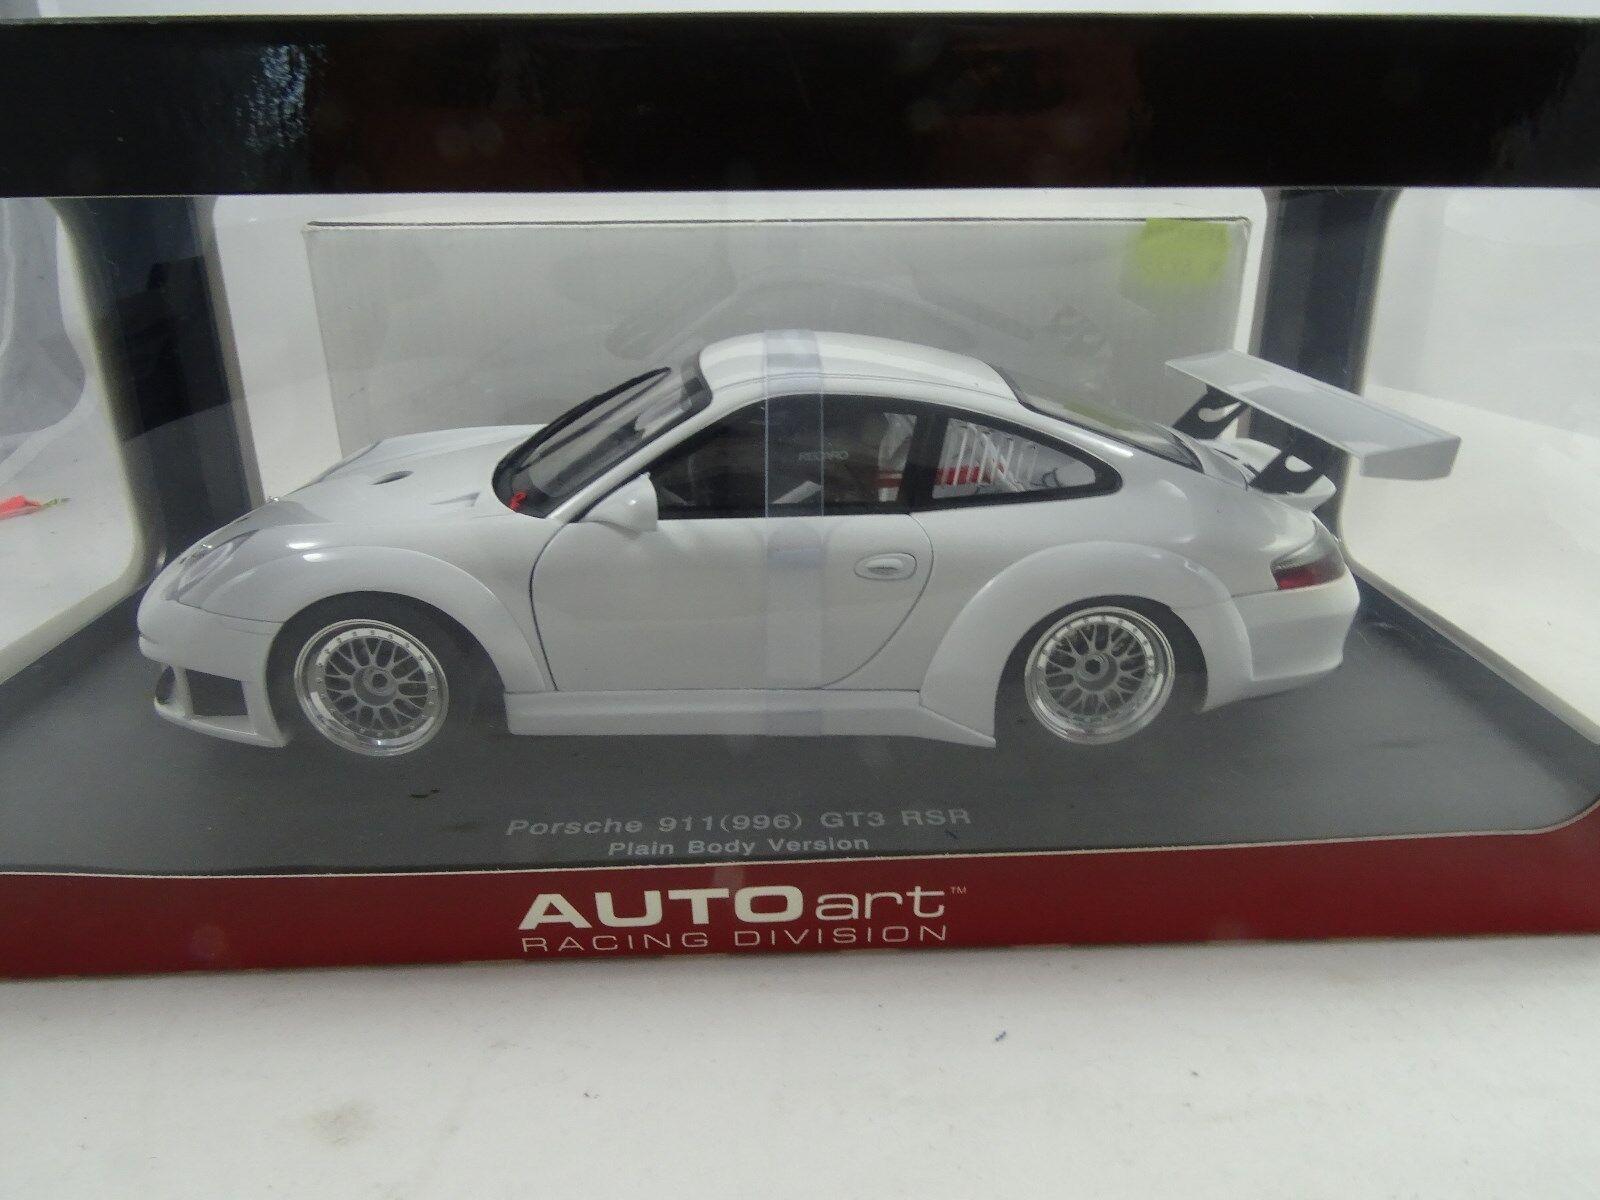 1 18 Autoart  80584 PORSCHE 911 (996) gt3 rsr 2005 Plain Body blanc-RARE §